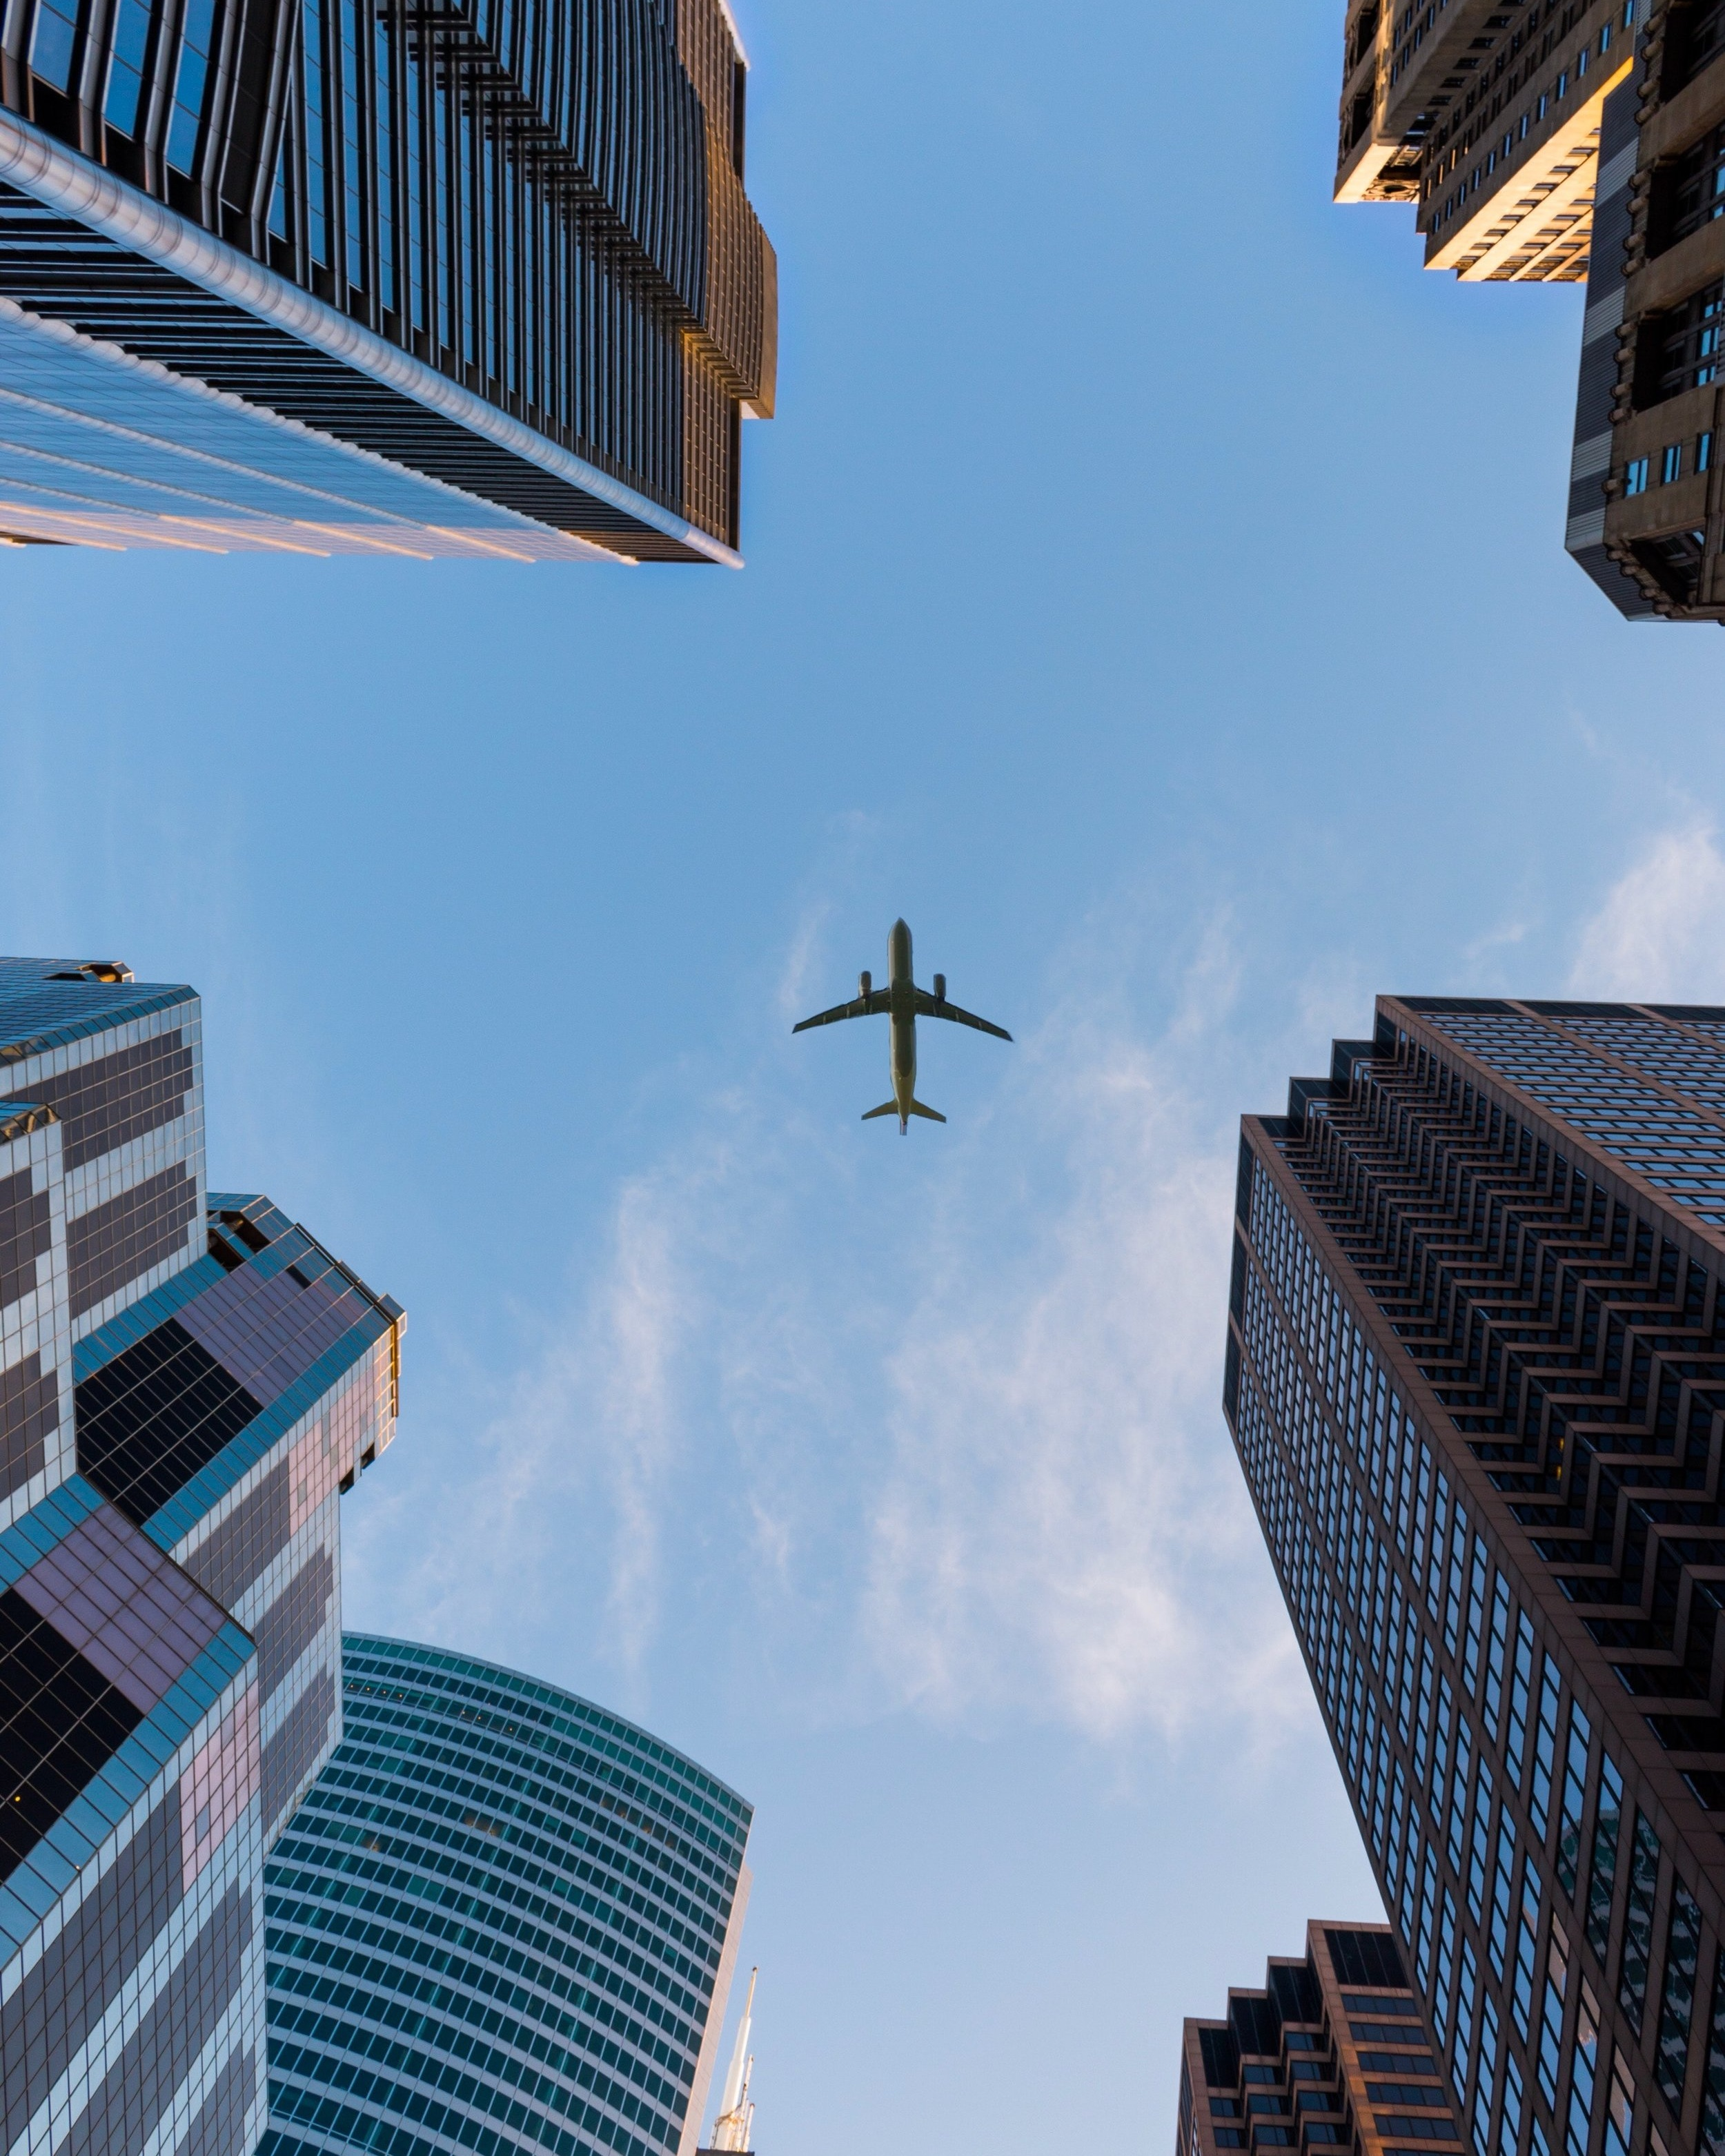 airplane-architecture-big-city-1157255.jpg